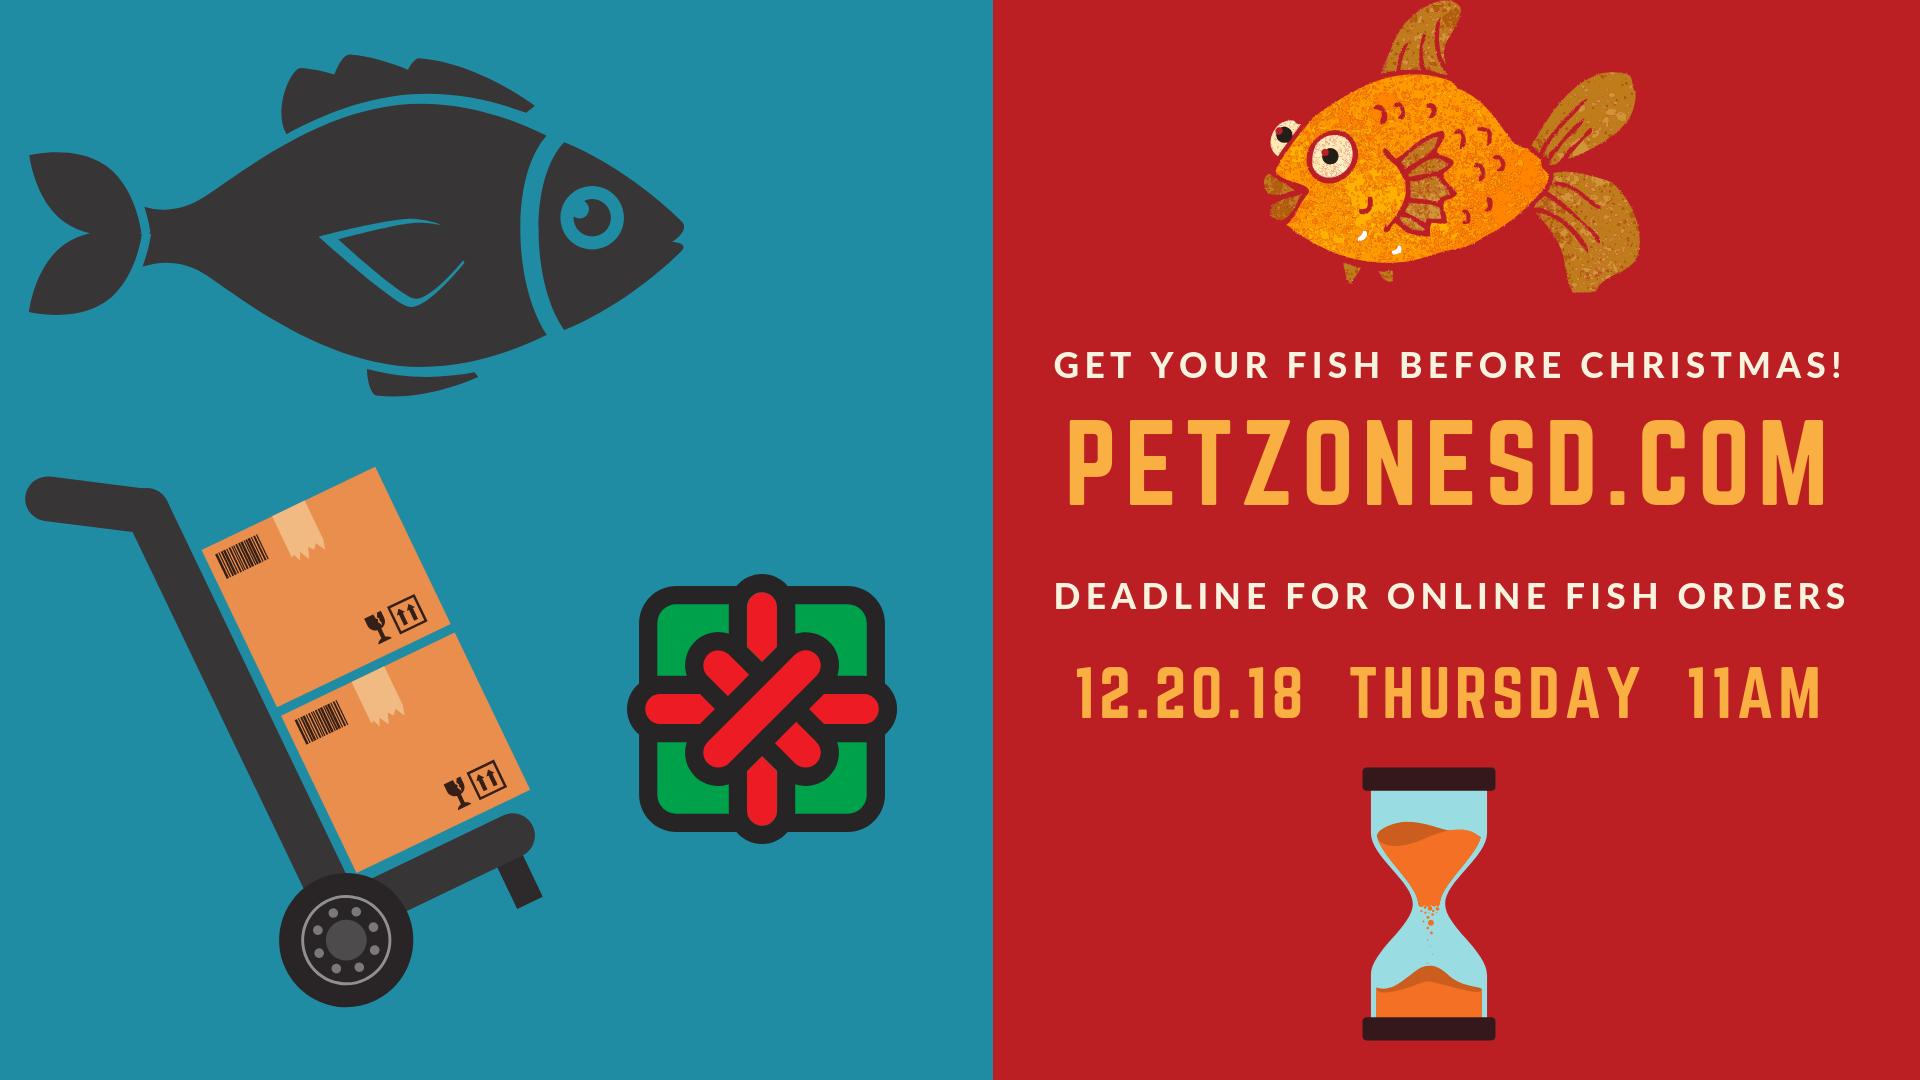 x-mas-fish-shipment-deadline-petzonesd.png